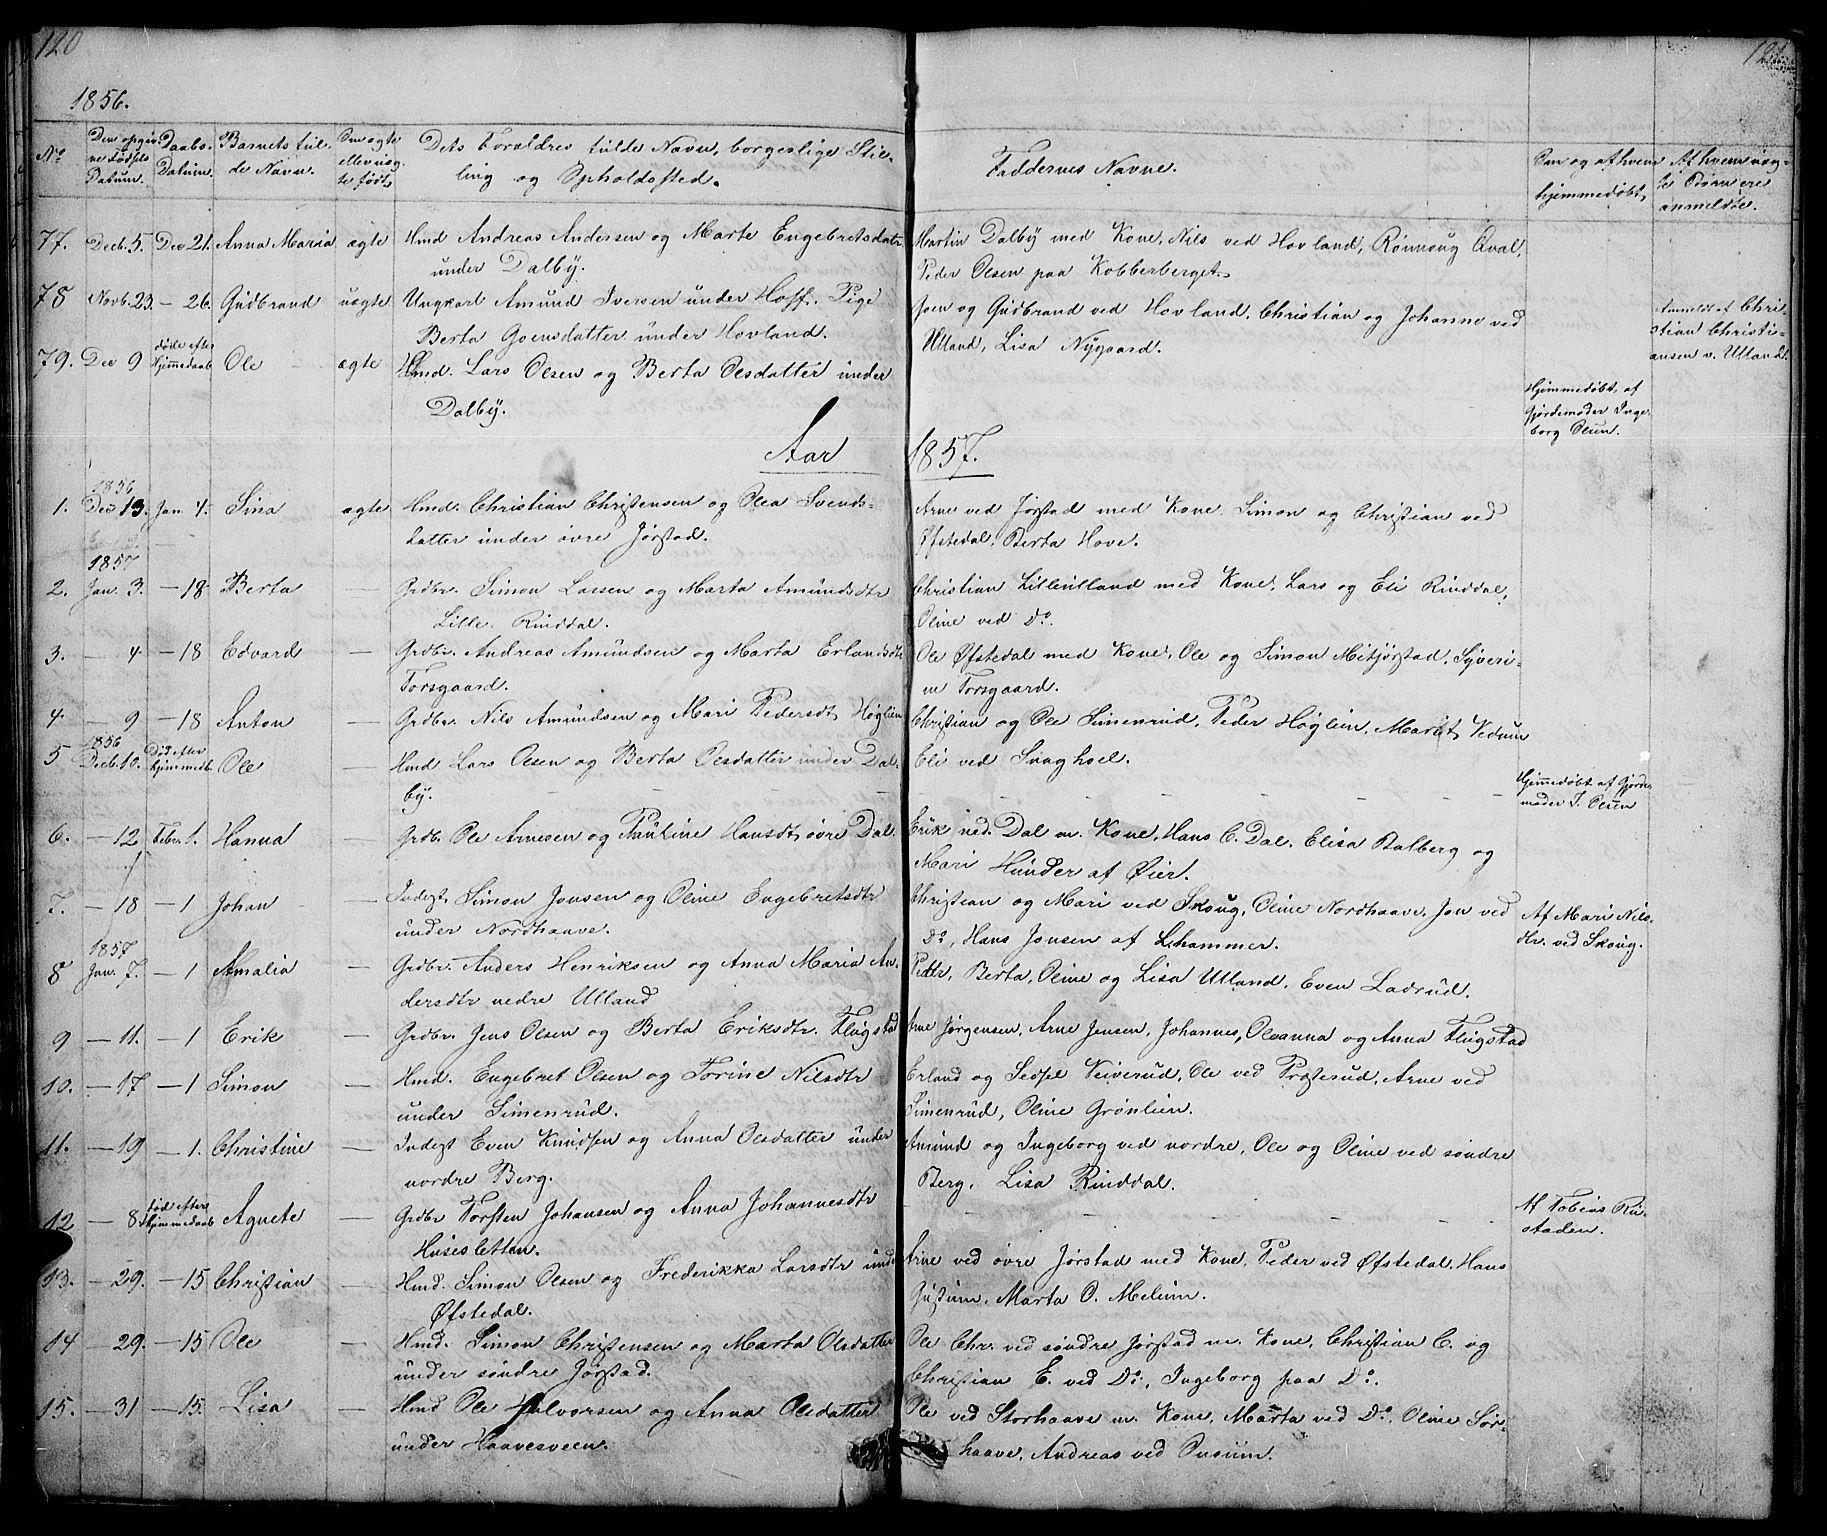 SAH, Fåberg prestekontor, Klokkerbok nr. 5, 1837-1864, s. 120-121